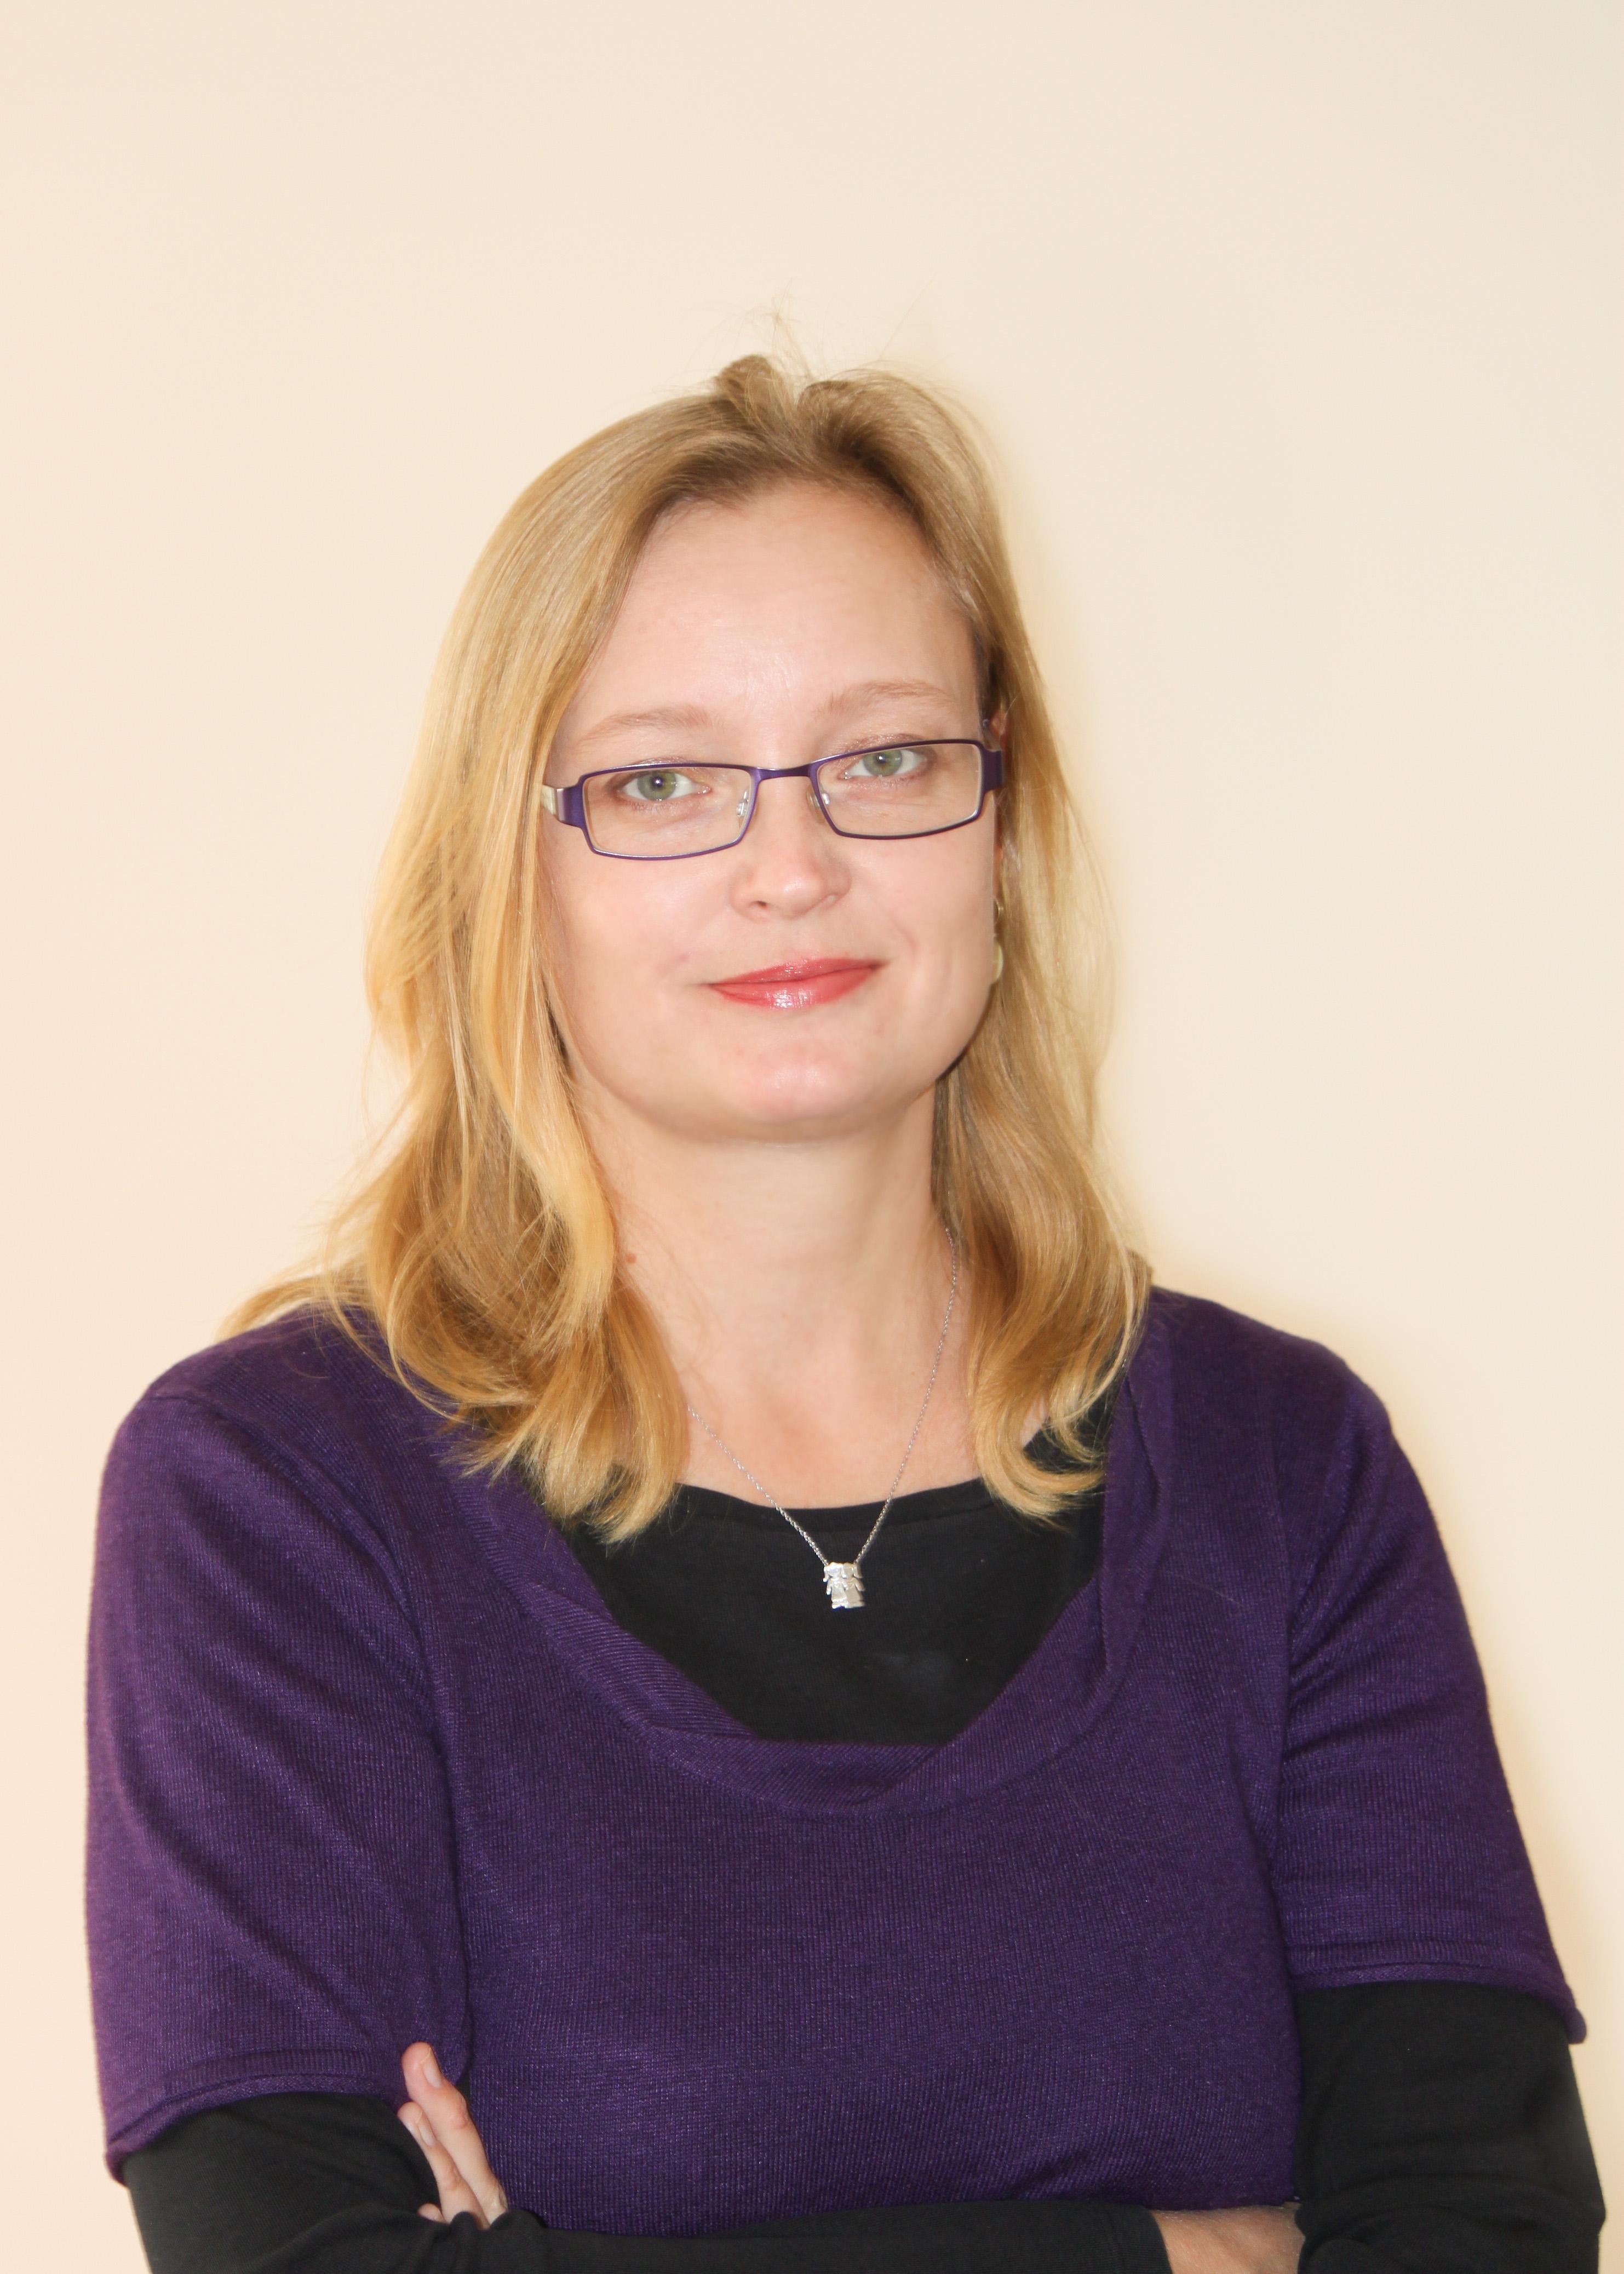 Sally Hetherington